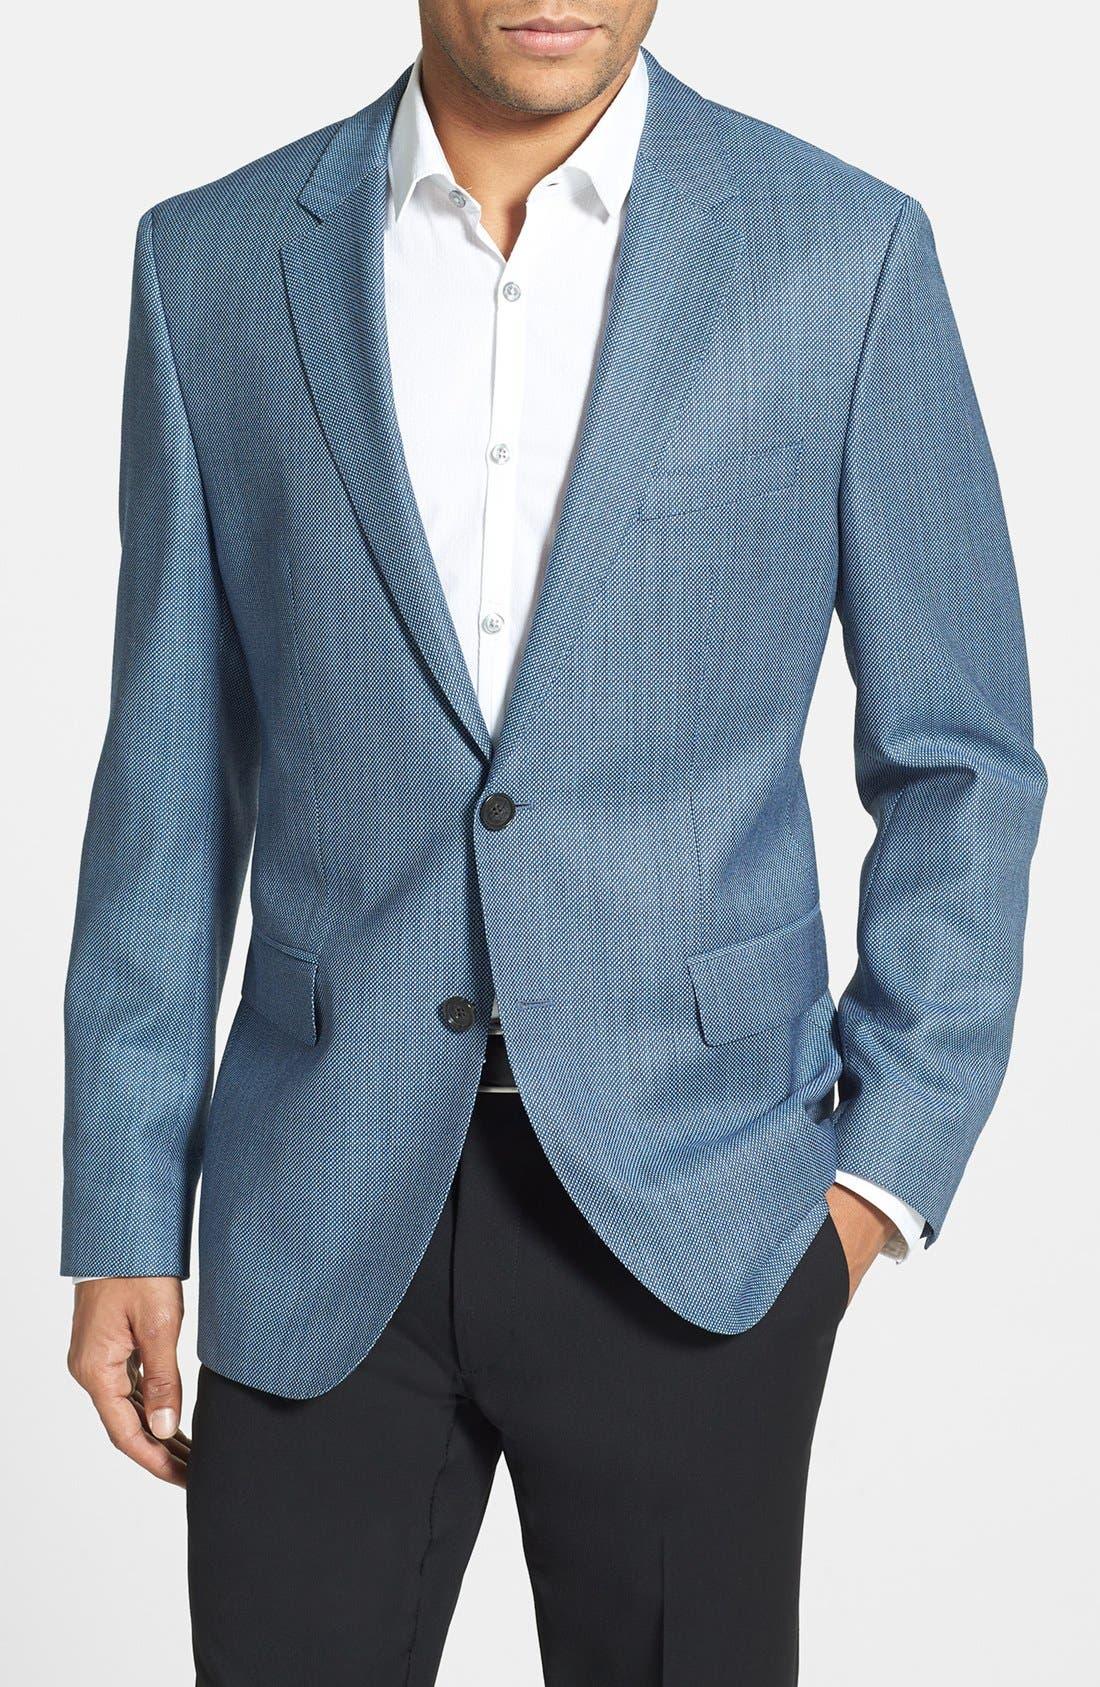 Alternate Image 1 Selected - BOSS HUGO BOSS 'James' Trim Fit Wool Blazer